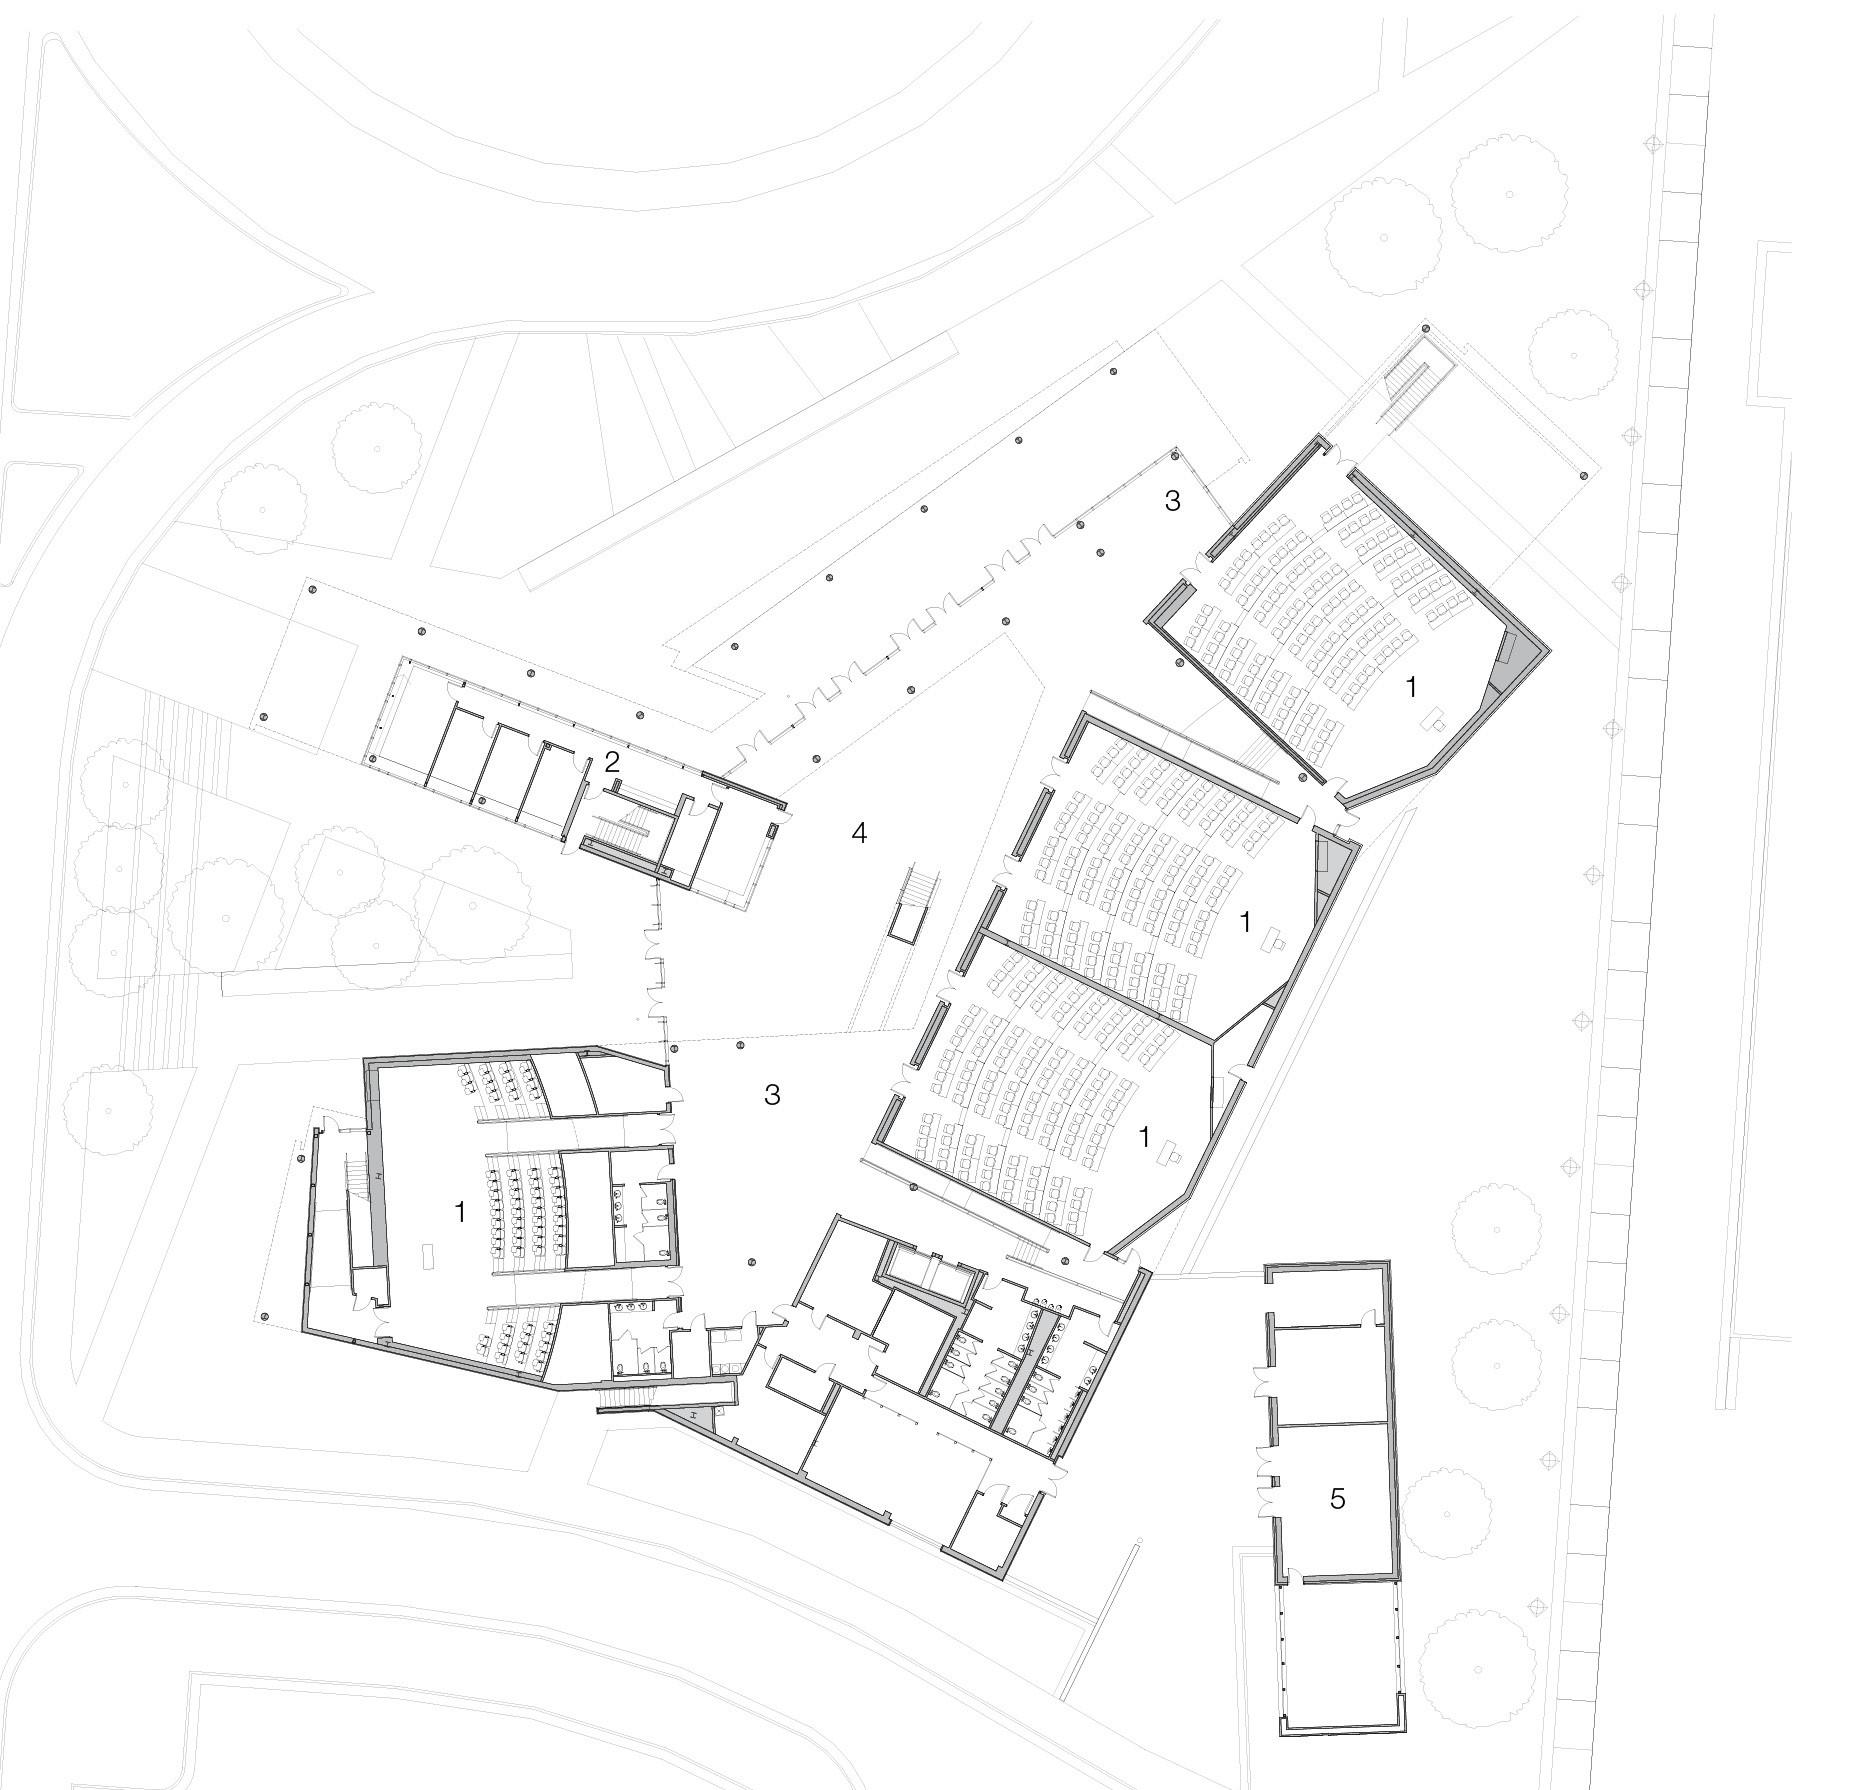 north carolina a t state university the freelon group architects ground floor plan